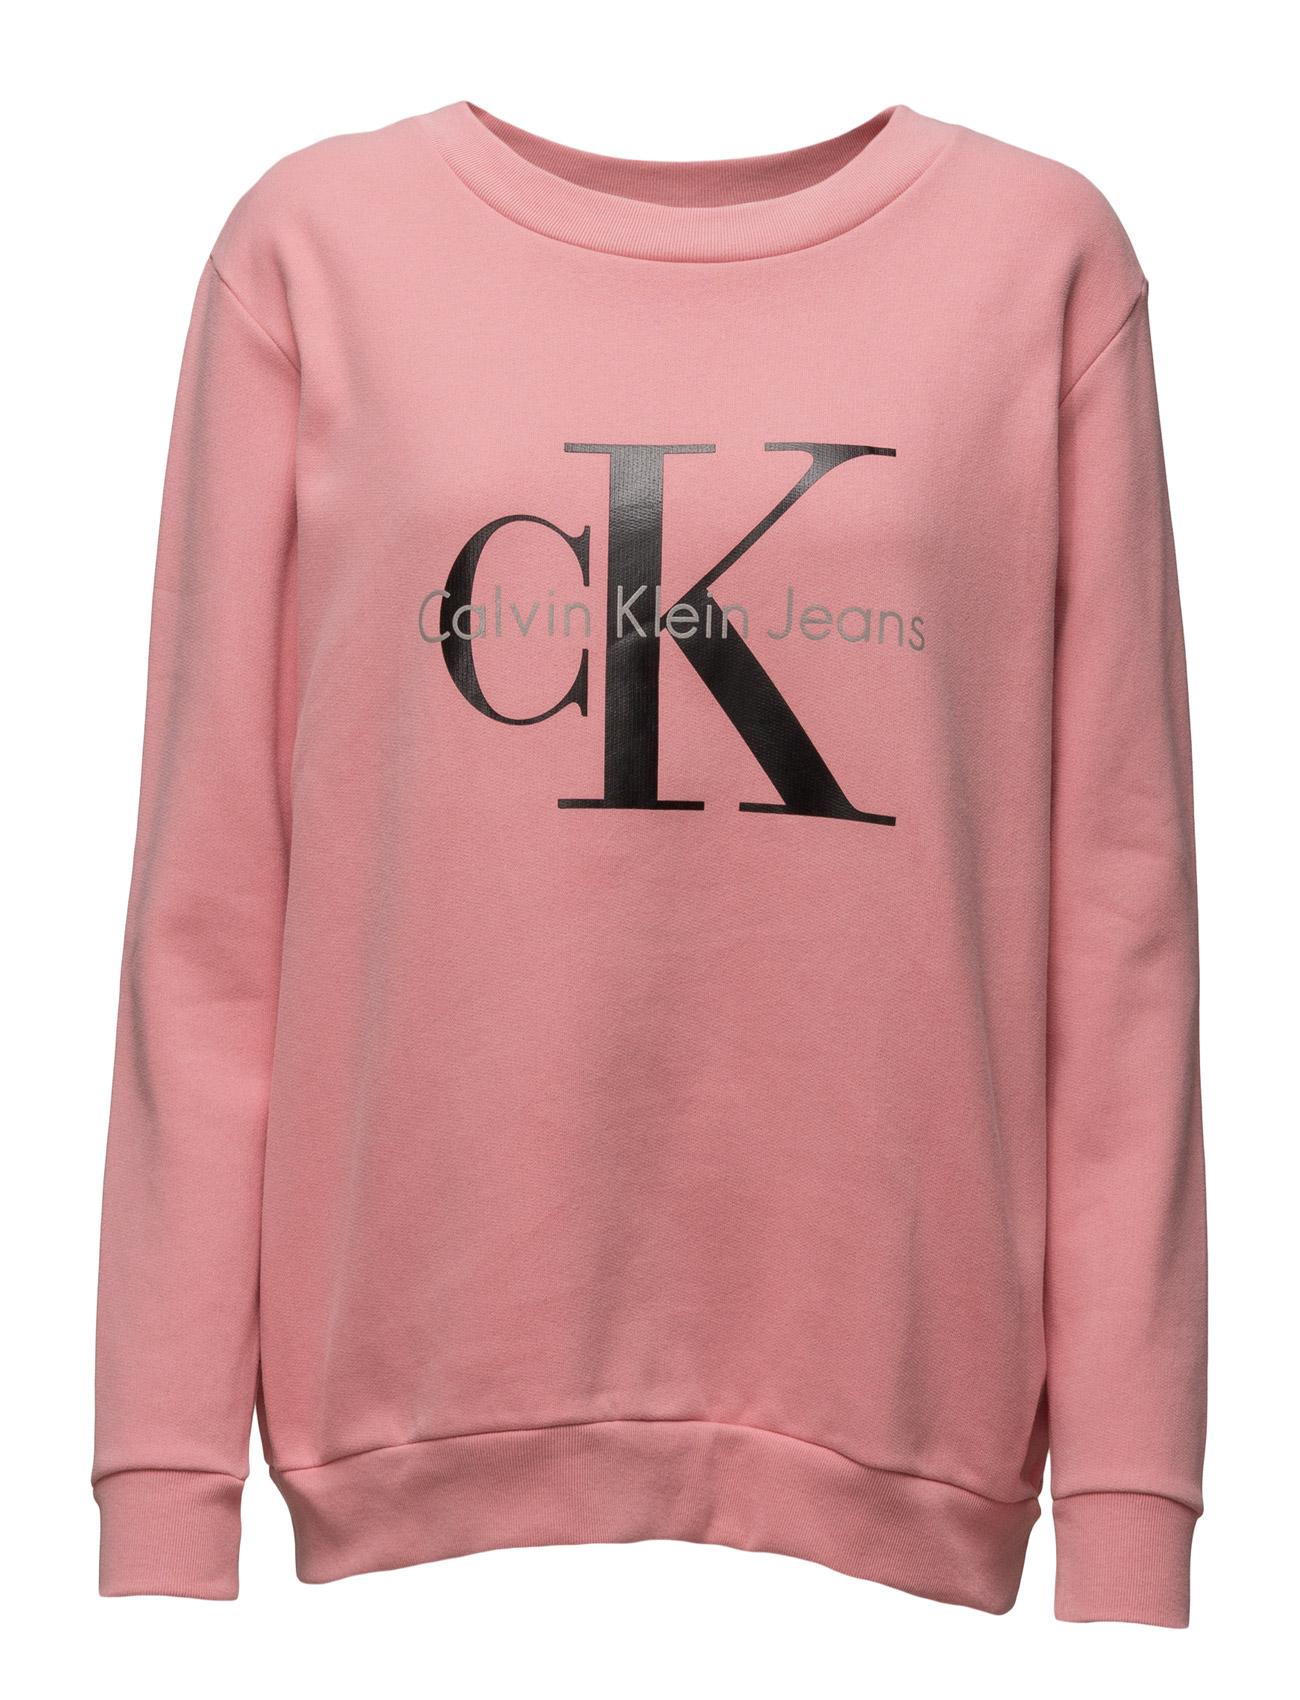 Crew Neck Hwk True I Calvin Klein Jeans  til Damer i